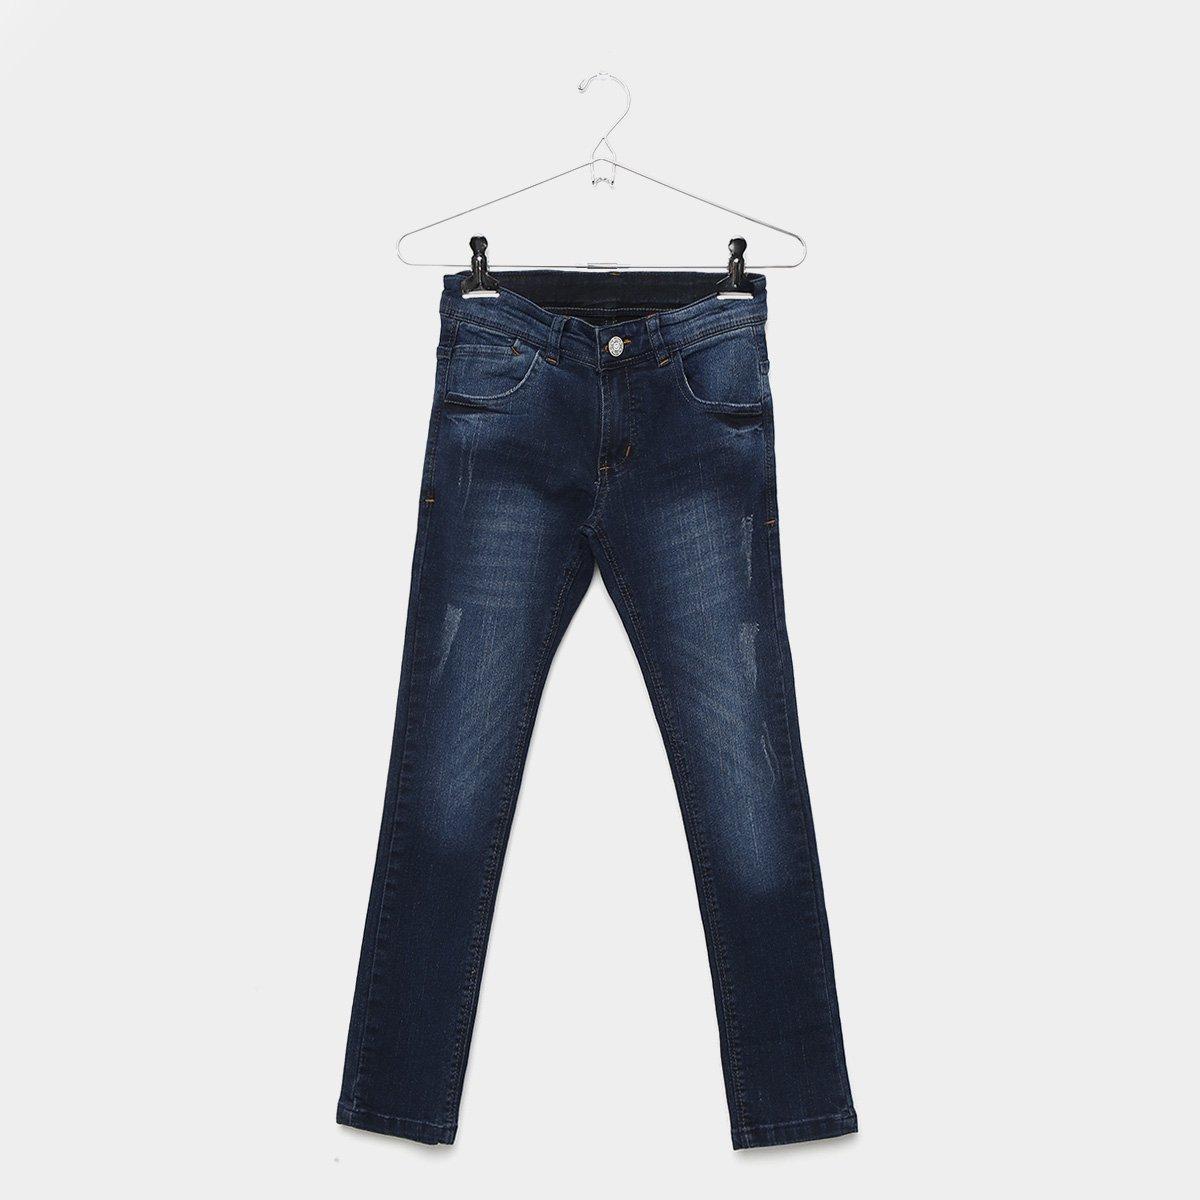 5ec8af8df Calça Jeans Infantil Grifle Skinny Estonada Puídos Masculina ...